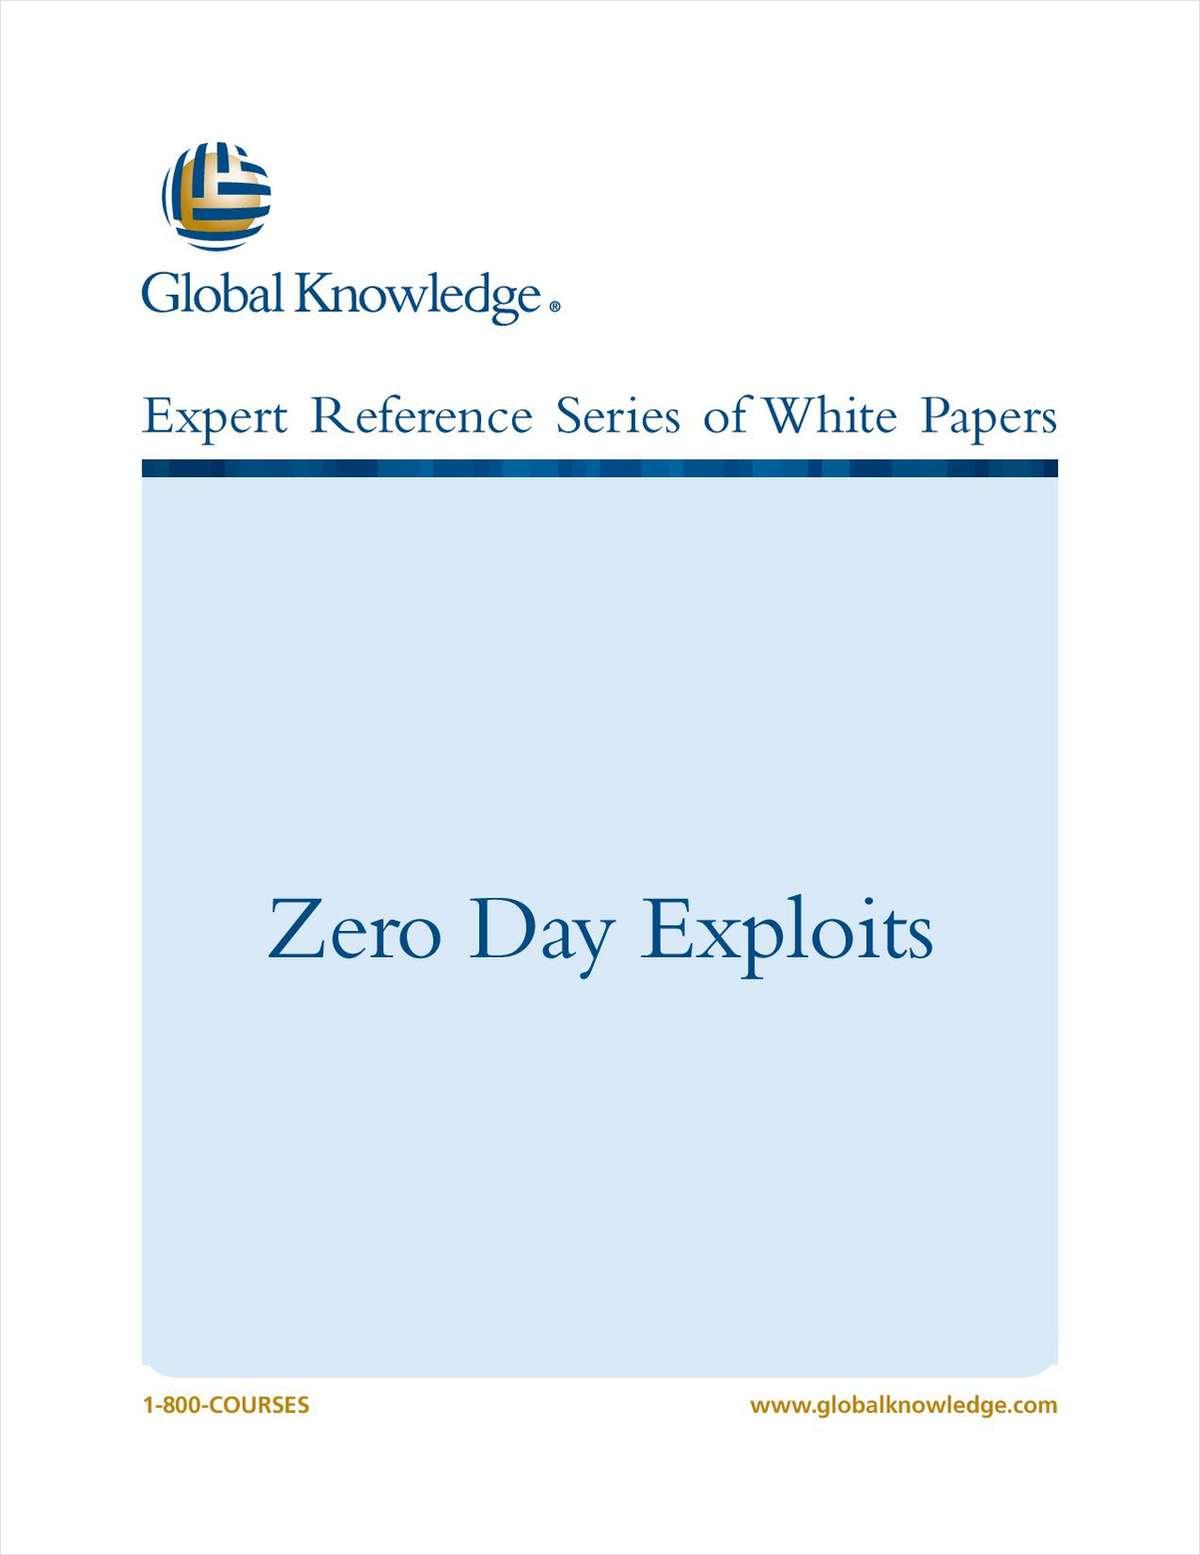 Zero Day Exploits